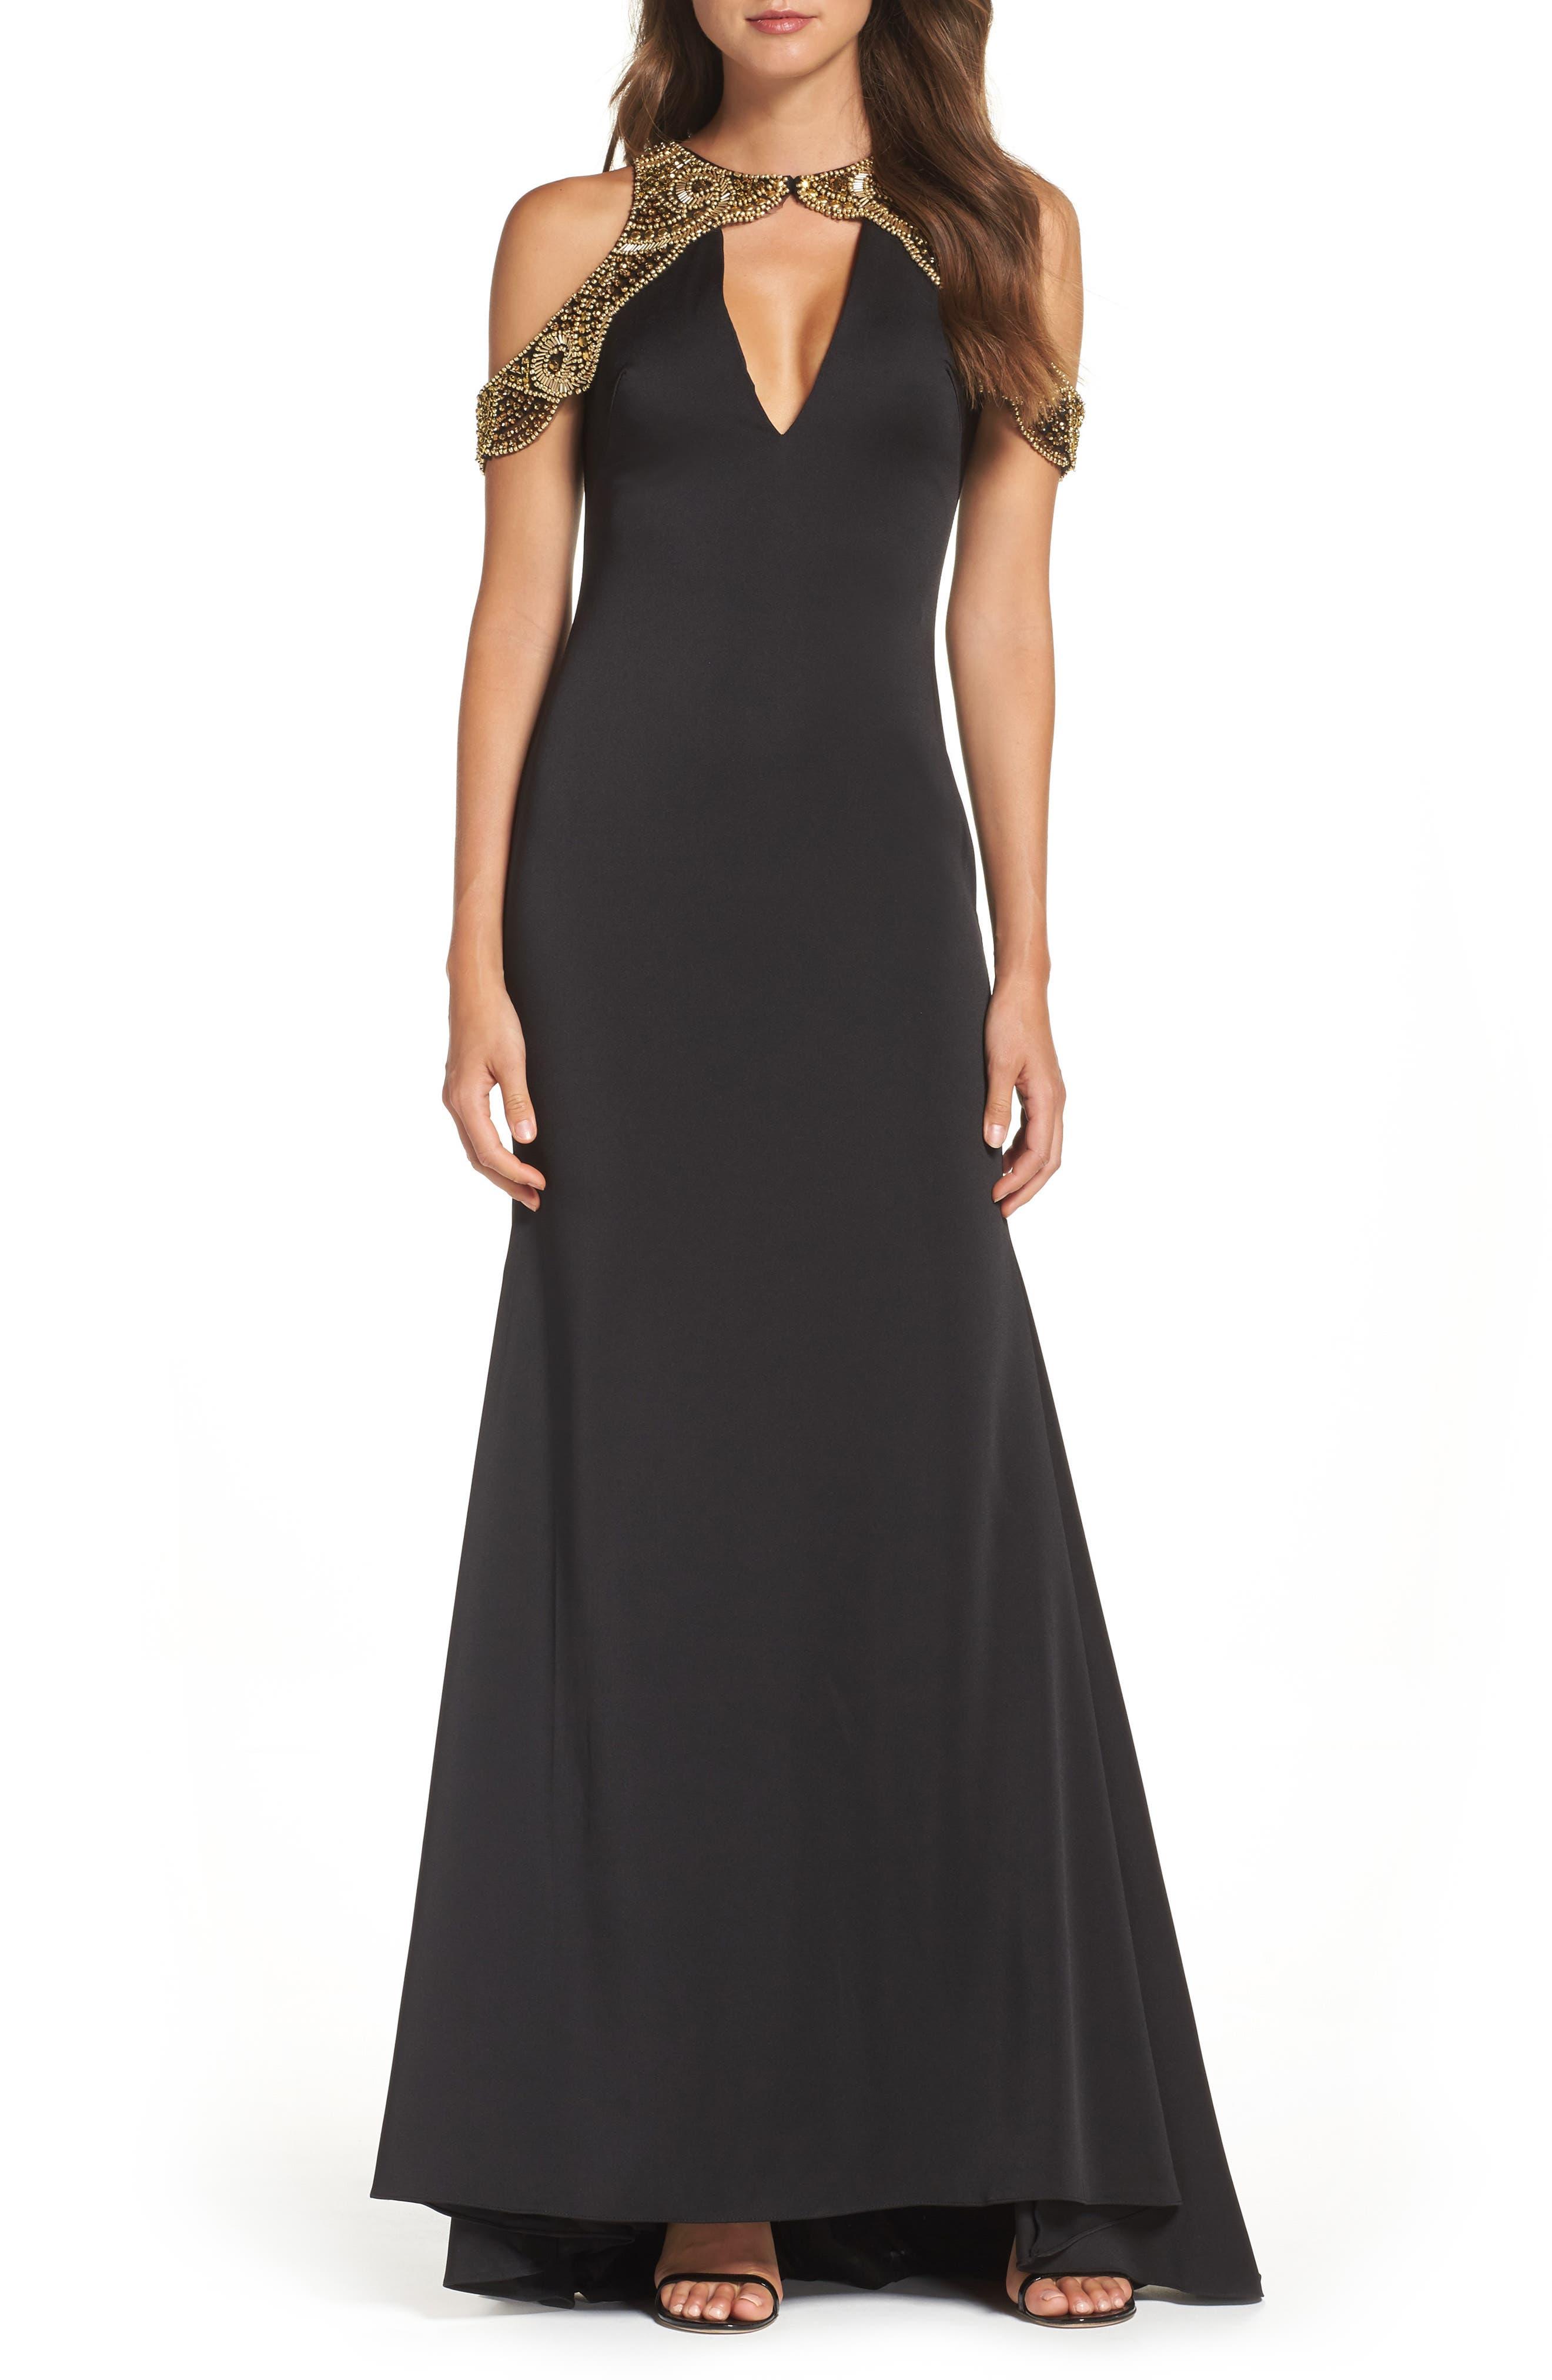 Alternate Image 1 Selected - Ieena for Mac Duggal Embellished Cold Shoulder Gown